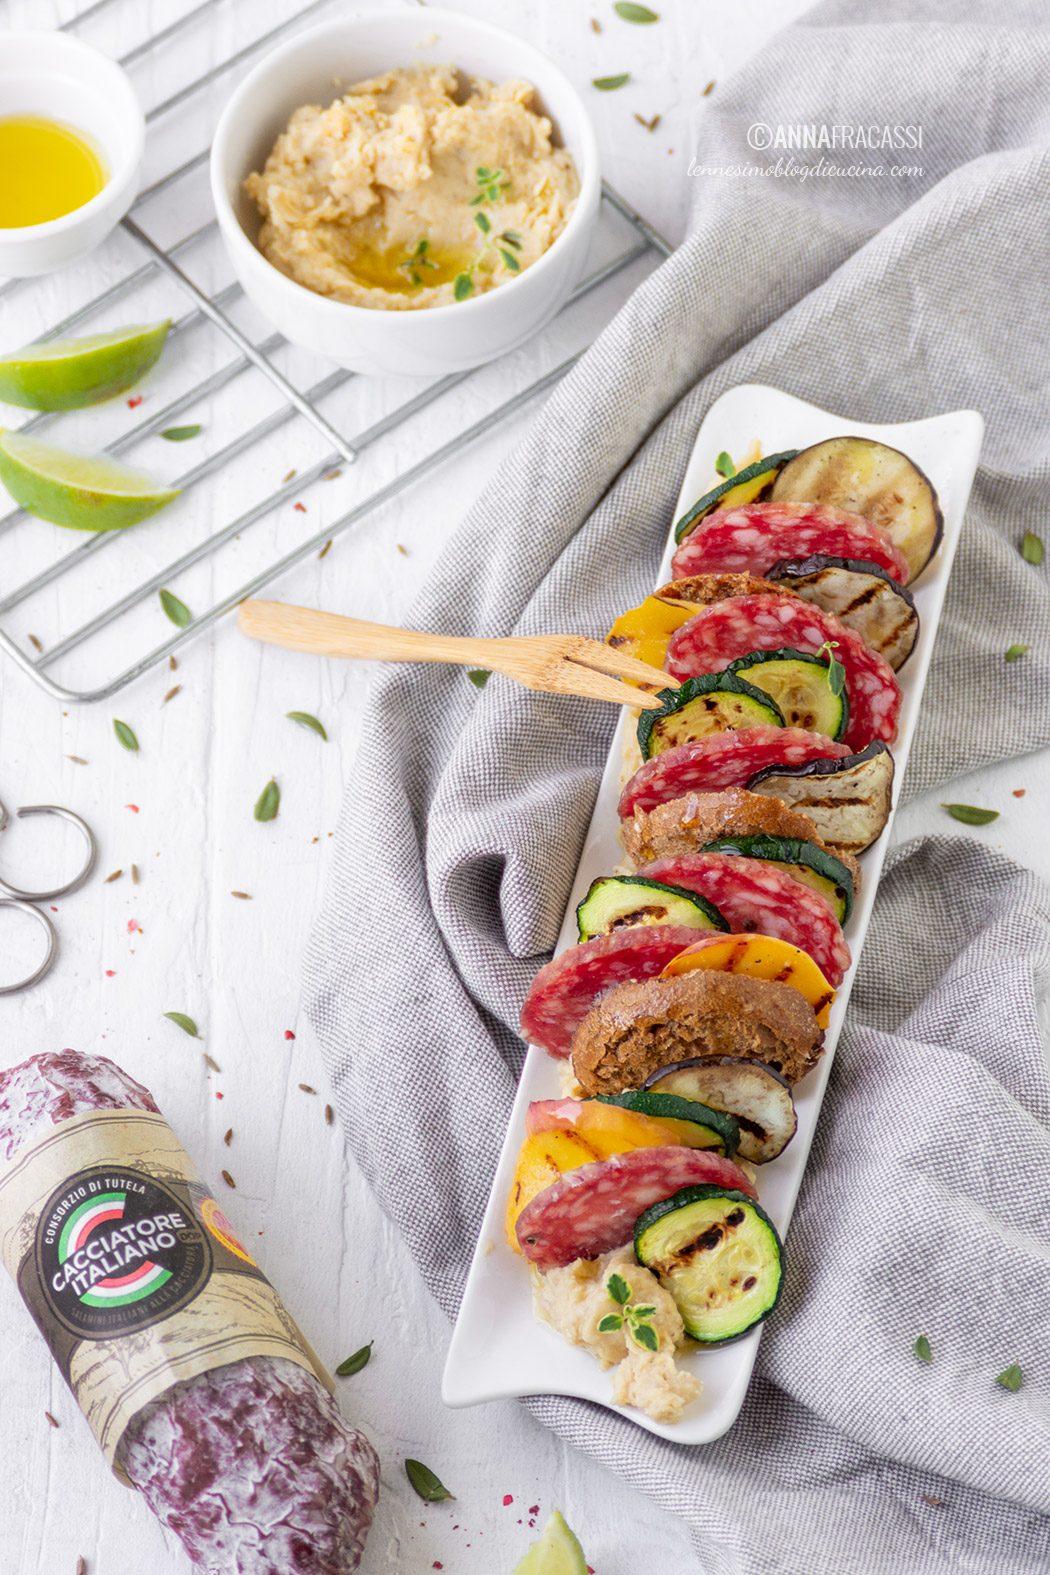 Millefoglie di verdure e Salame Cacciatore Italiano